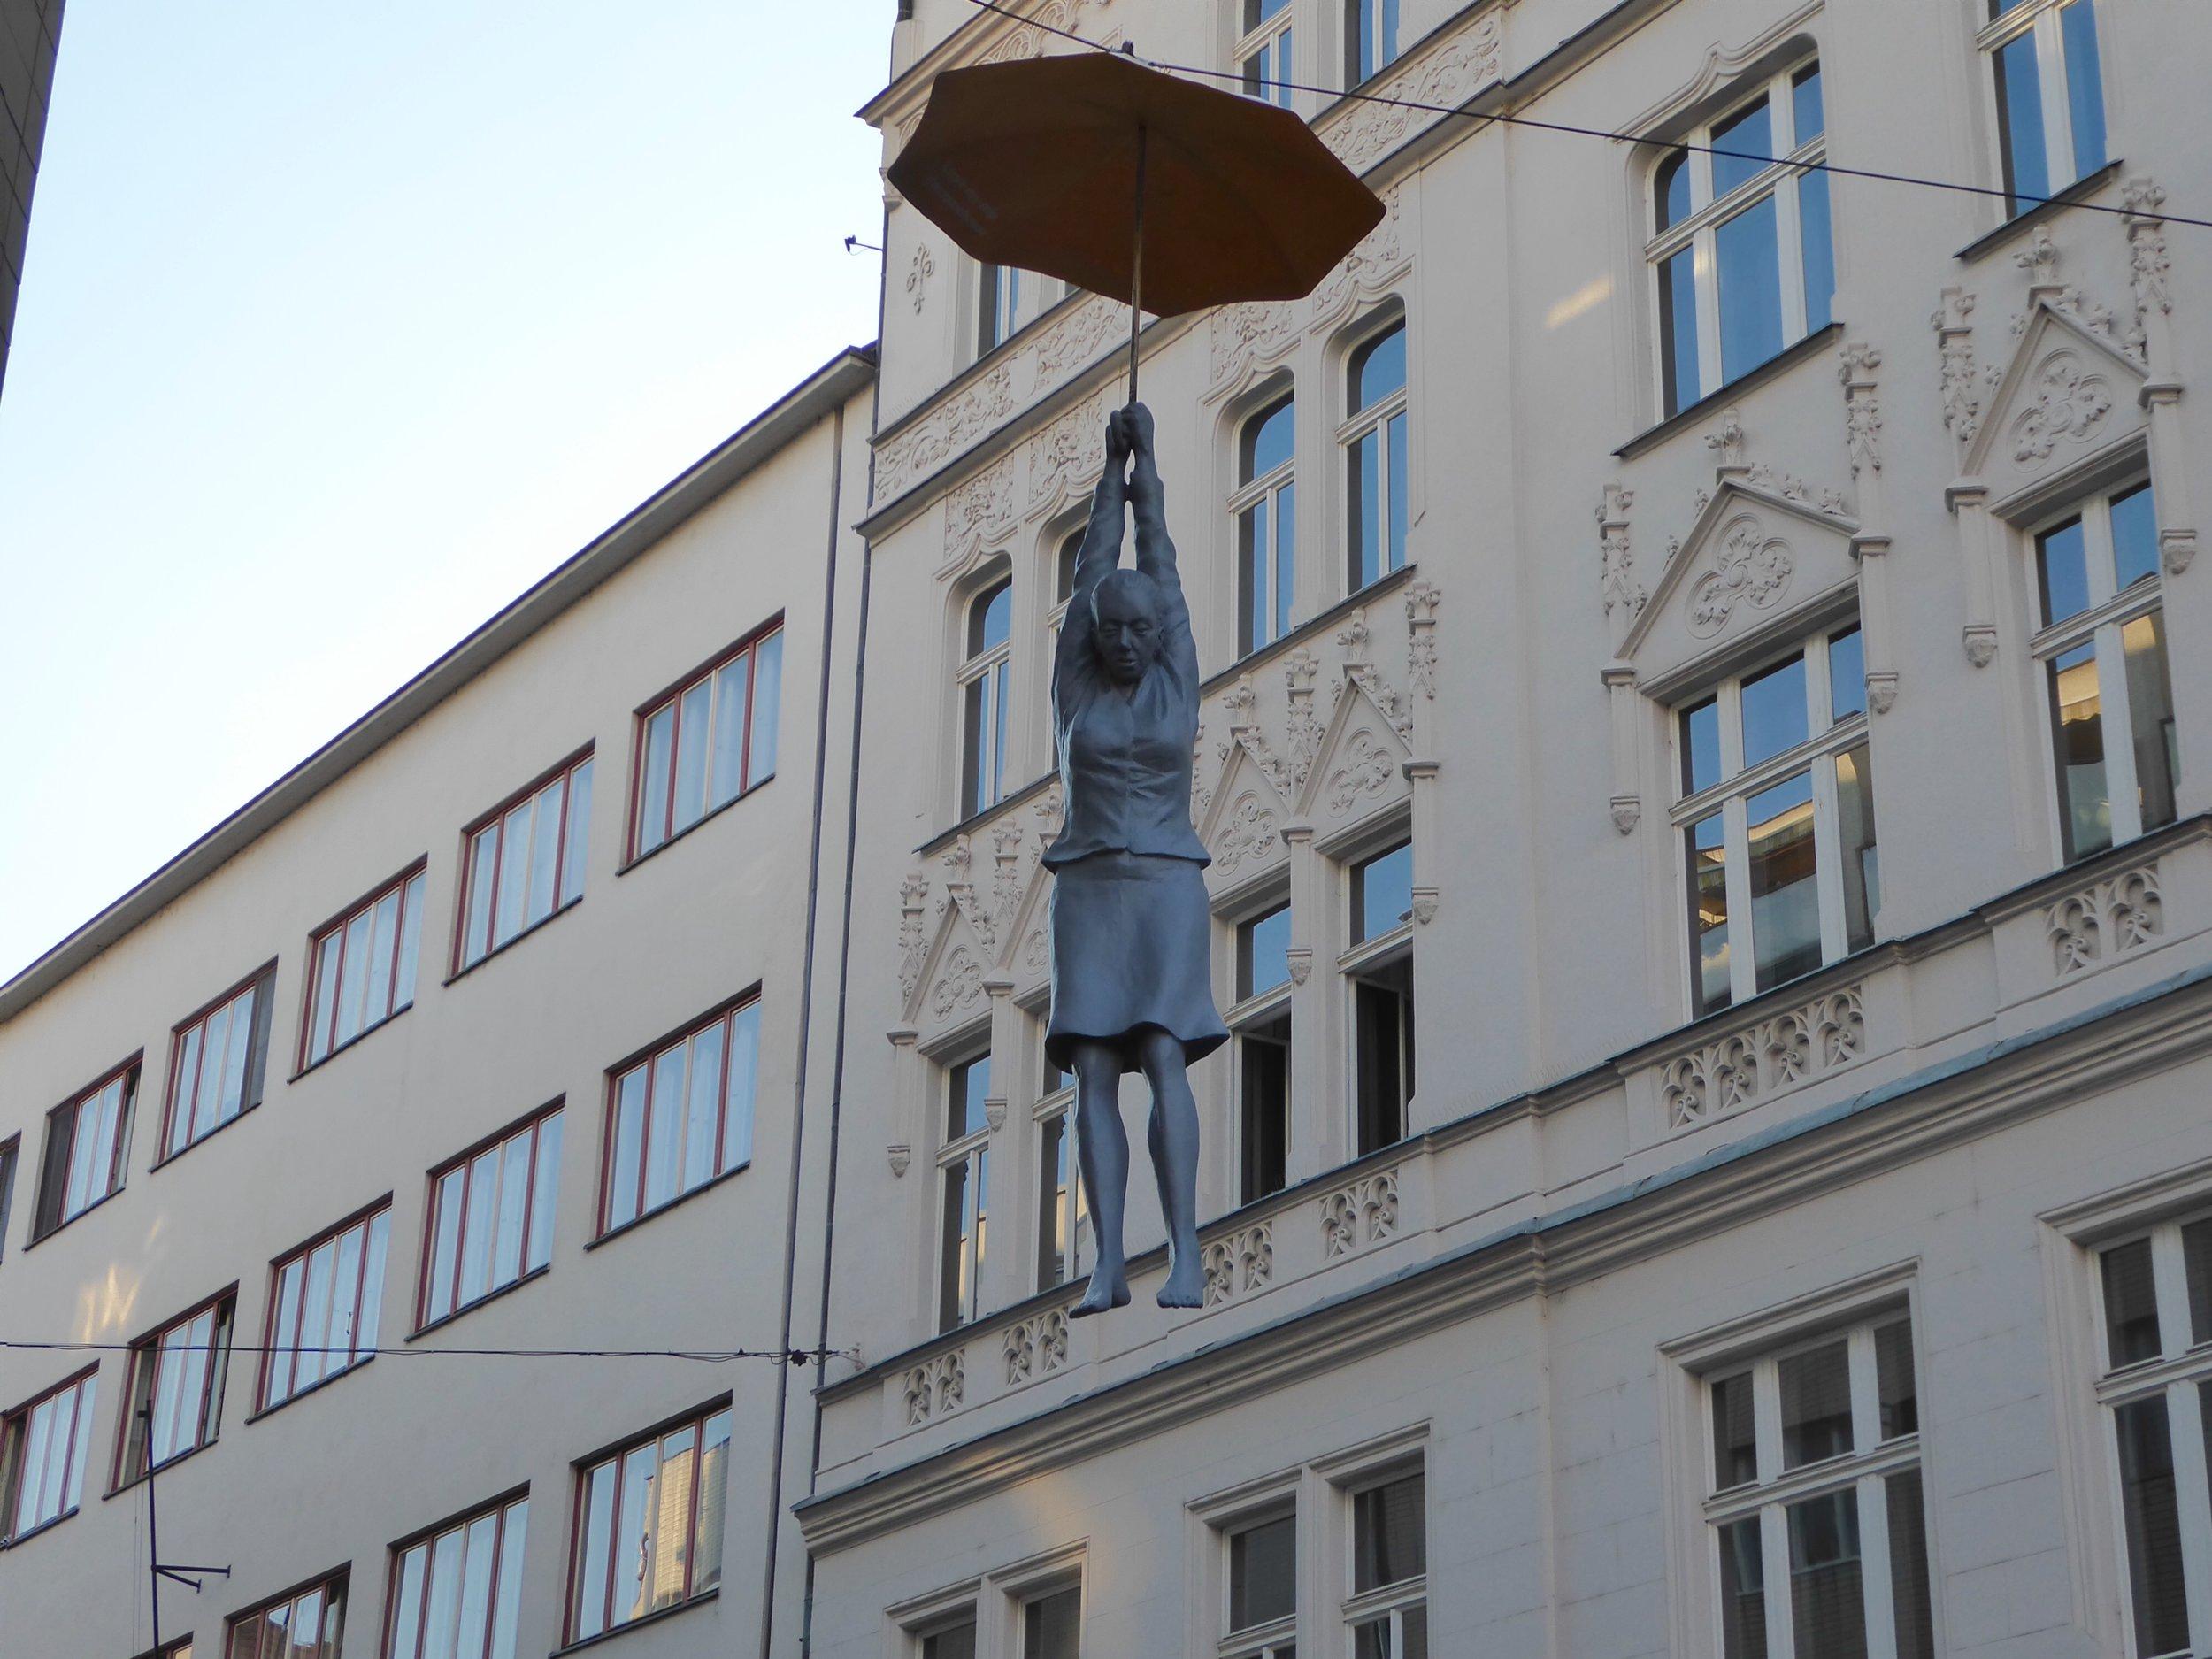 When in Prague, Look Up!